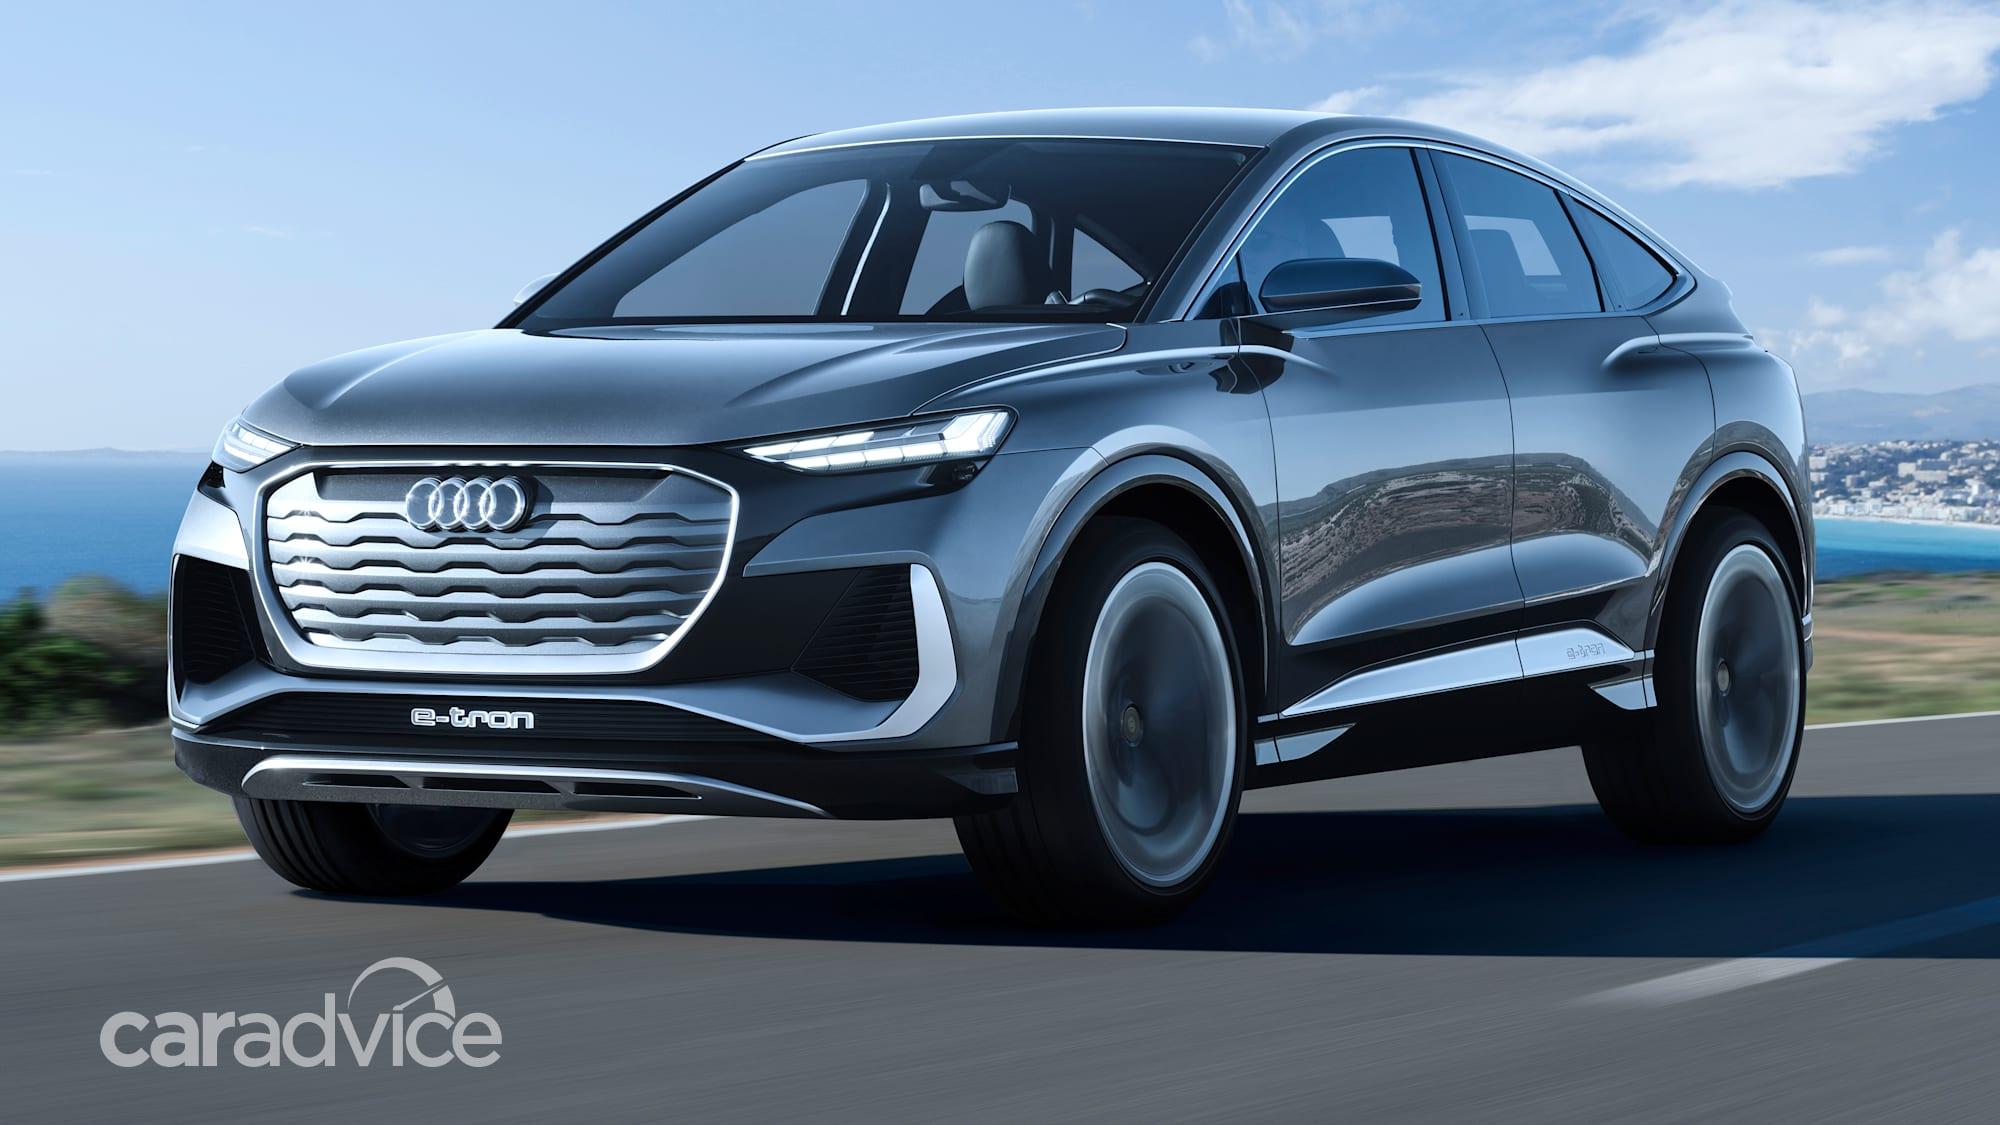 2021 audi q4 sportback etron concept revealed  caradvice